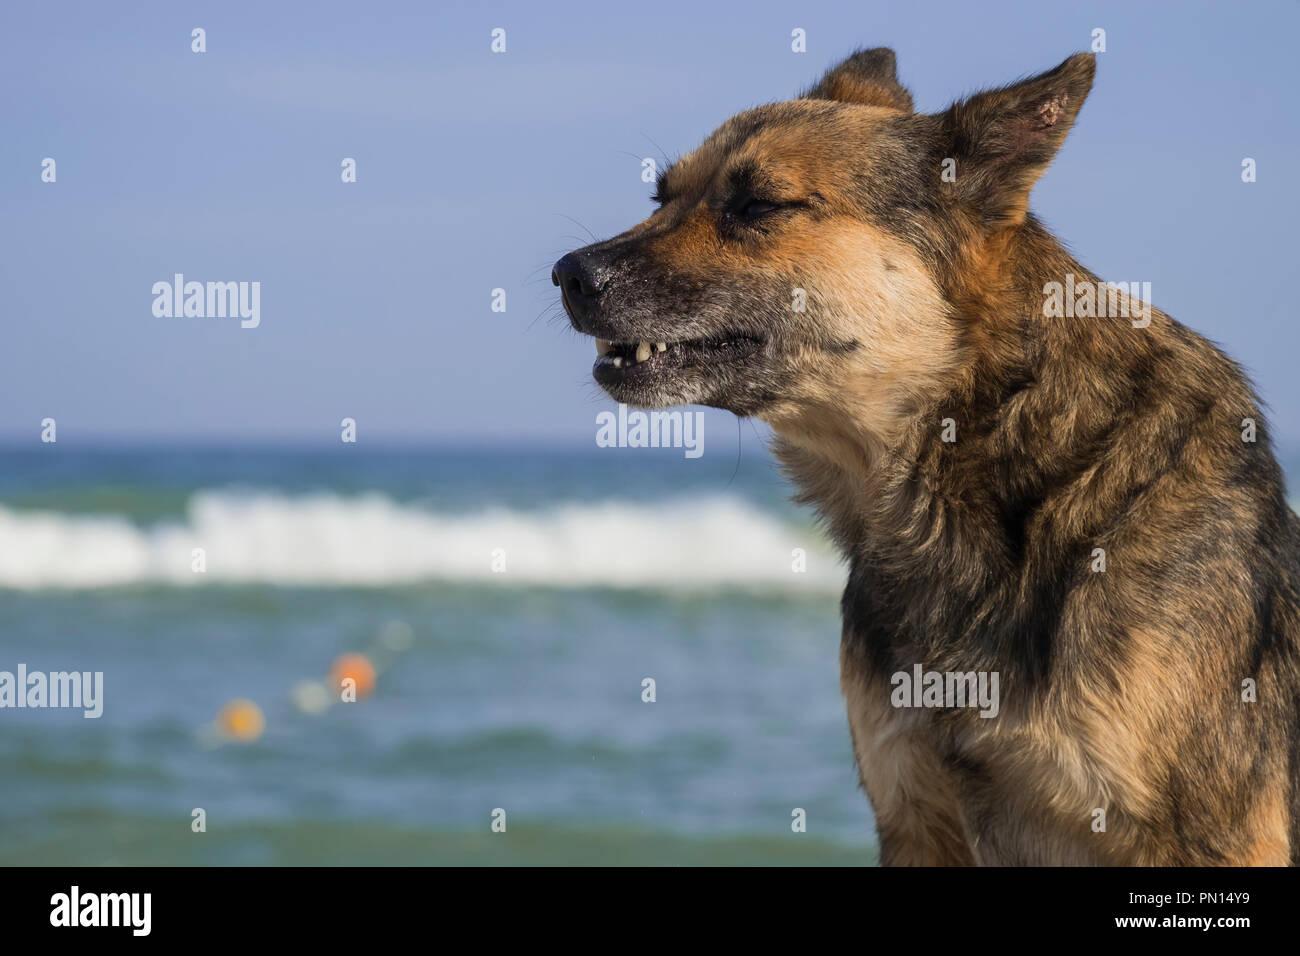 Stray dog on the seashore howls a sad song - Stock Image